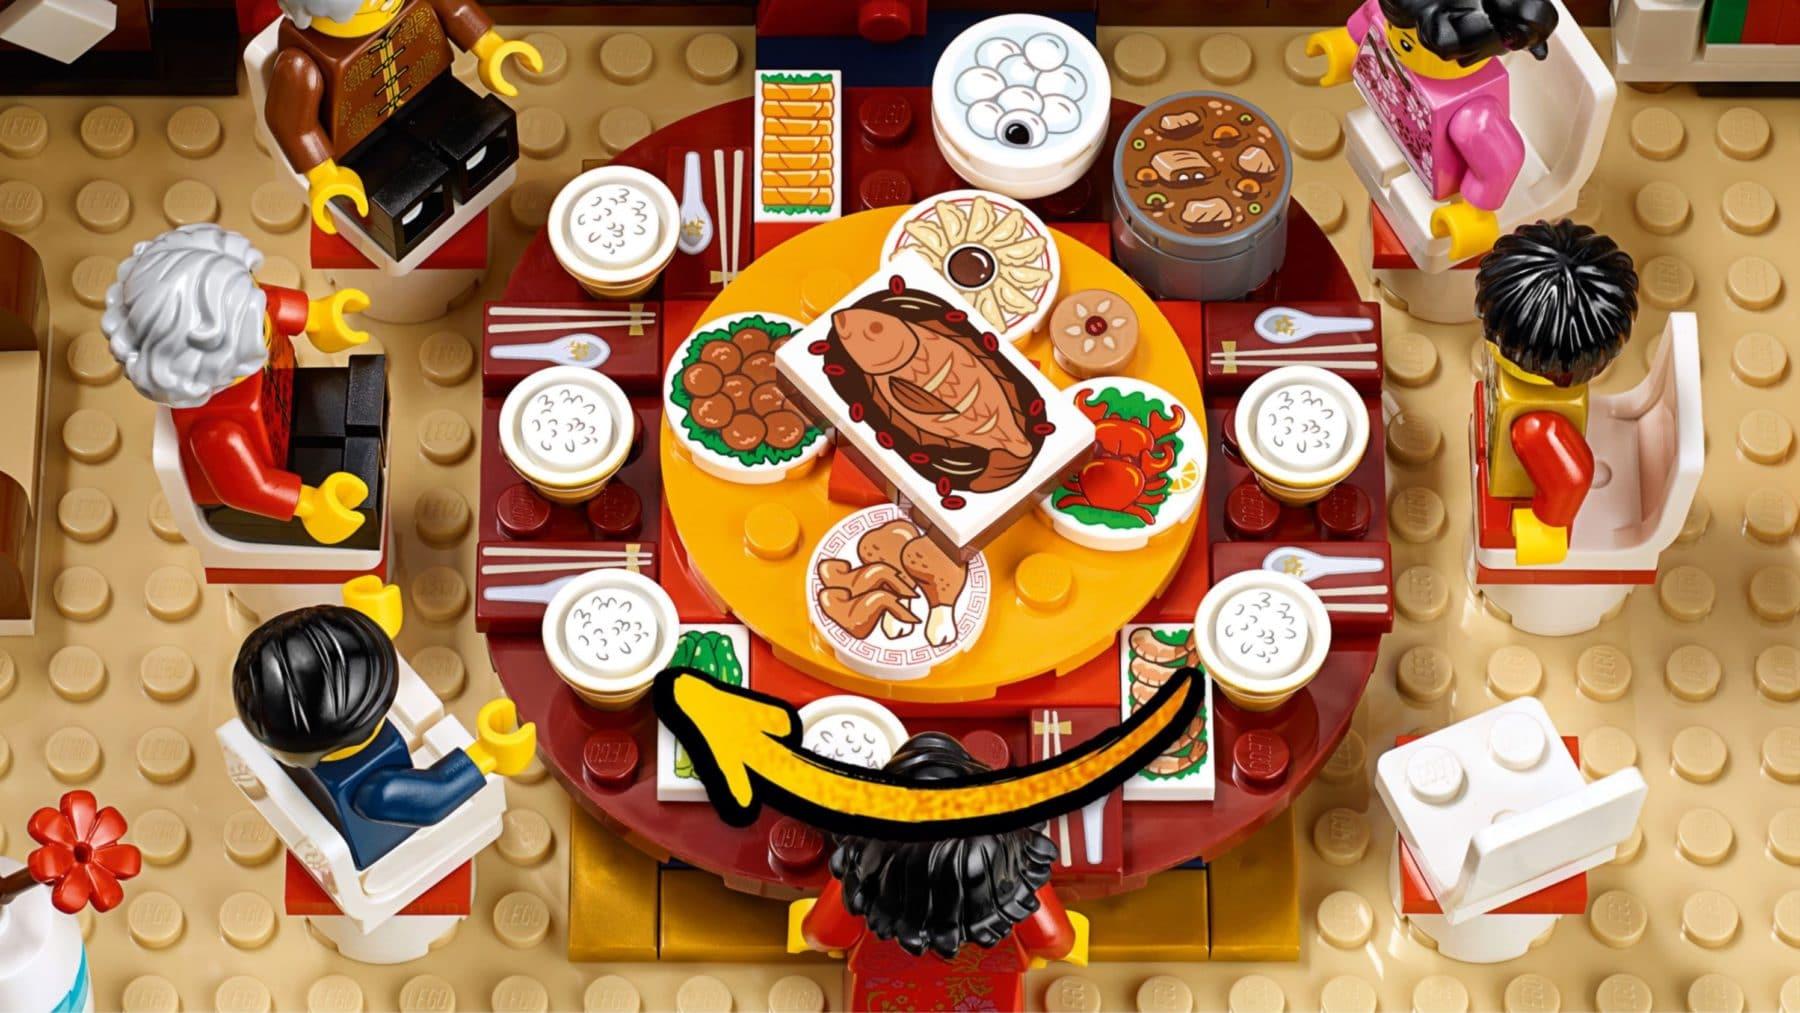 LEGO 80101 Chinese New Years Eve Dinner: Drehbarer Tisch